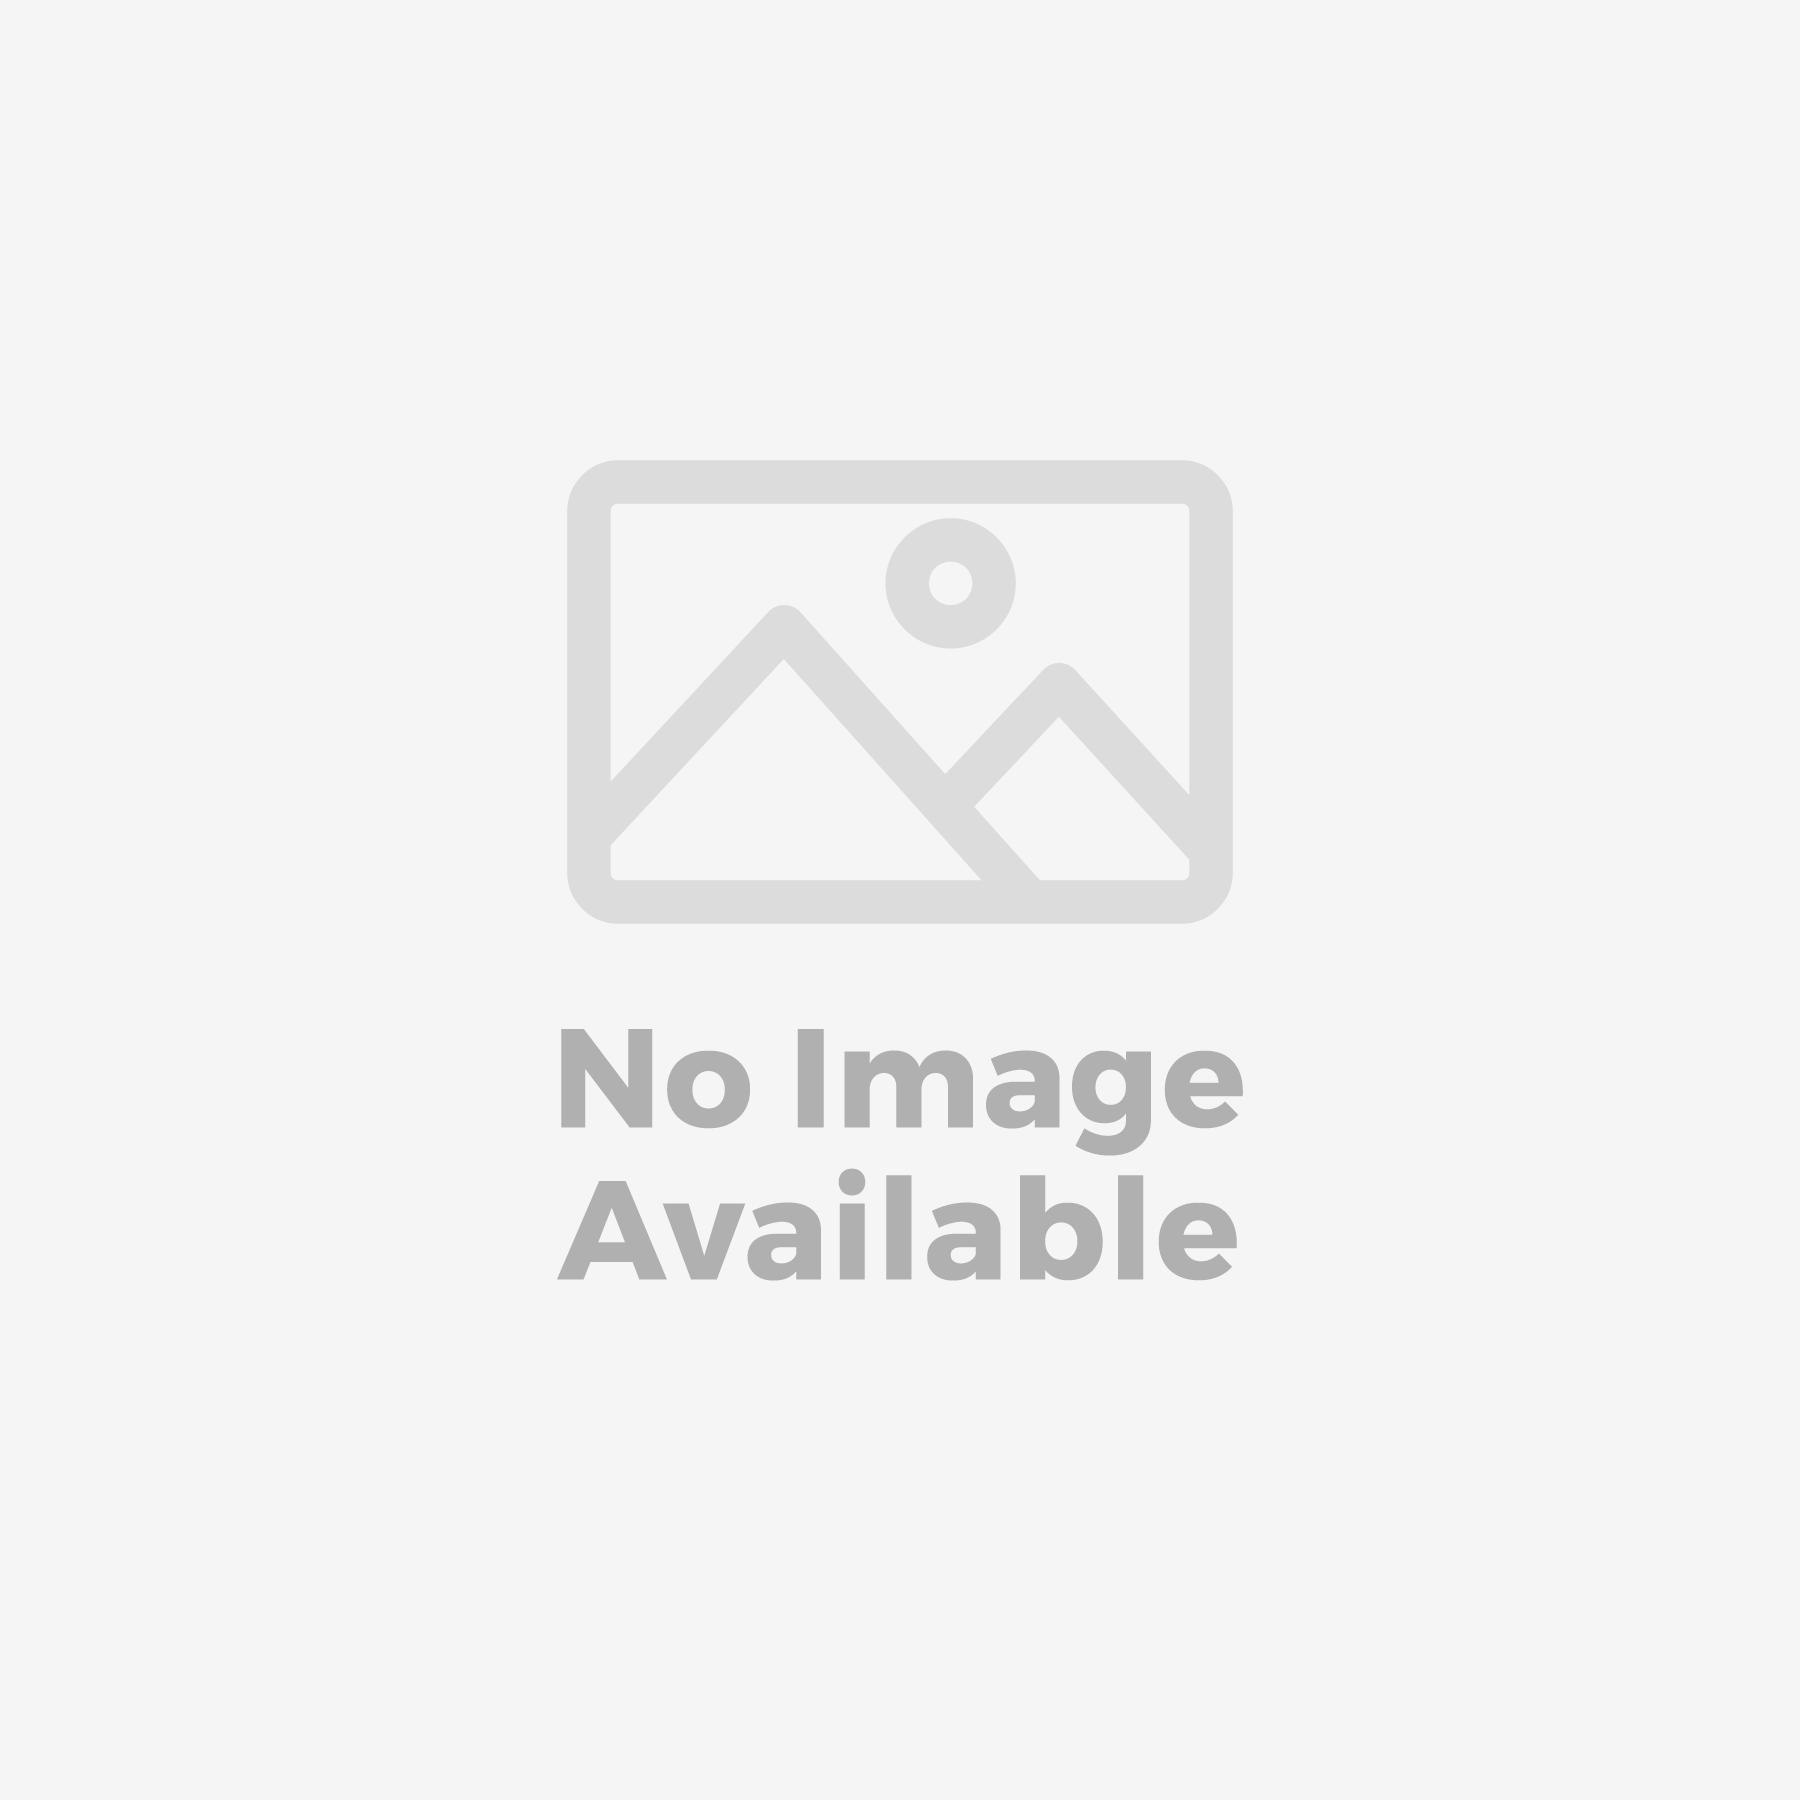 Santa Barbara Outdoor Lounge Chair